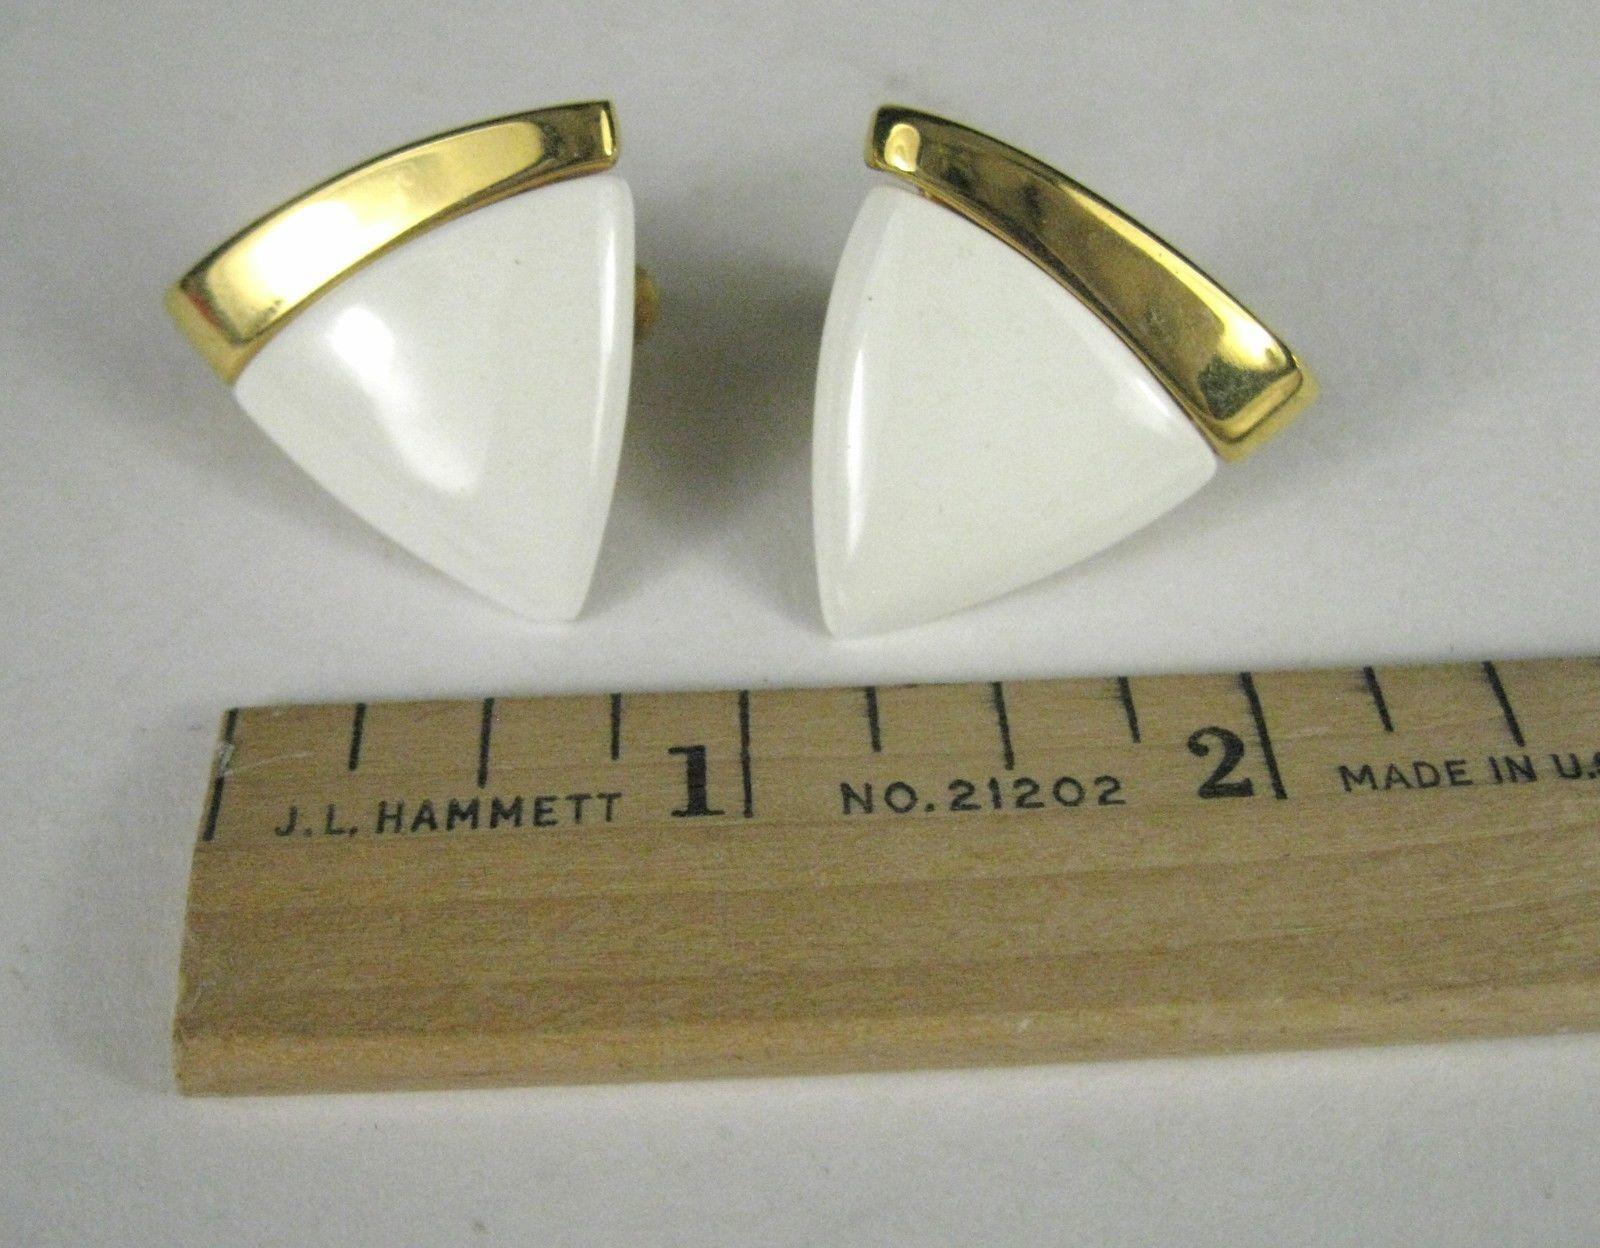 NAPIER Clip Earring Screw Back White Lucite Goldtone Signed VTG Vintage image 6